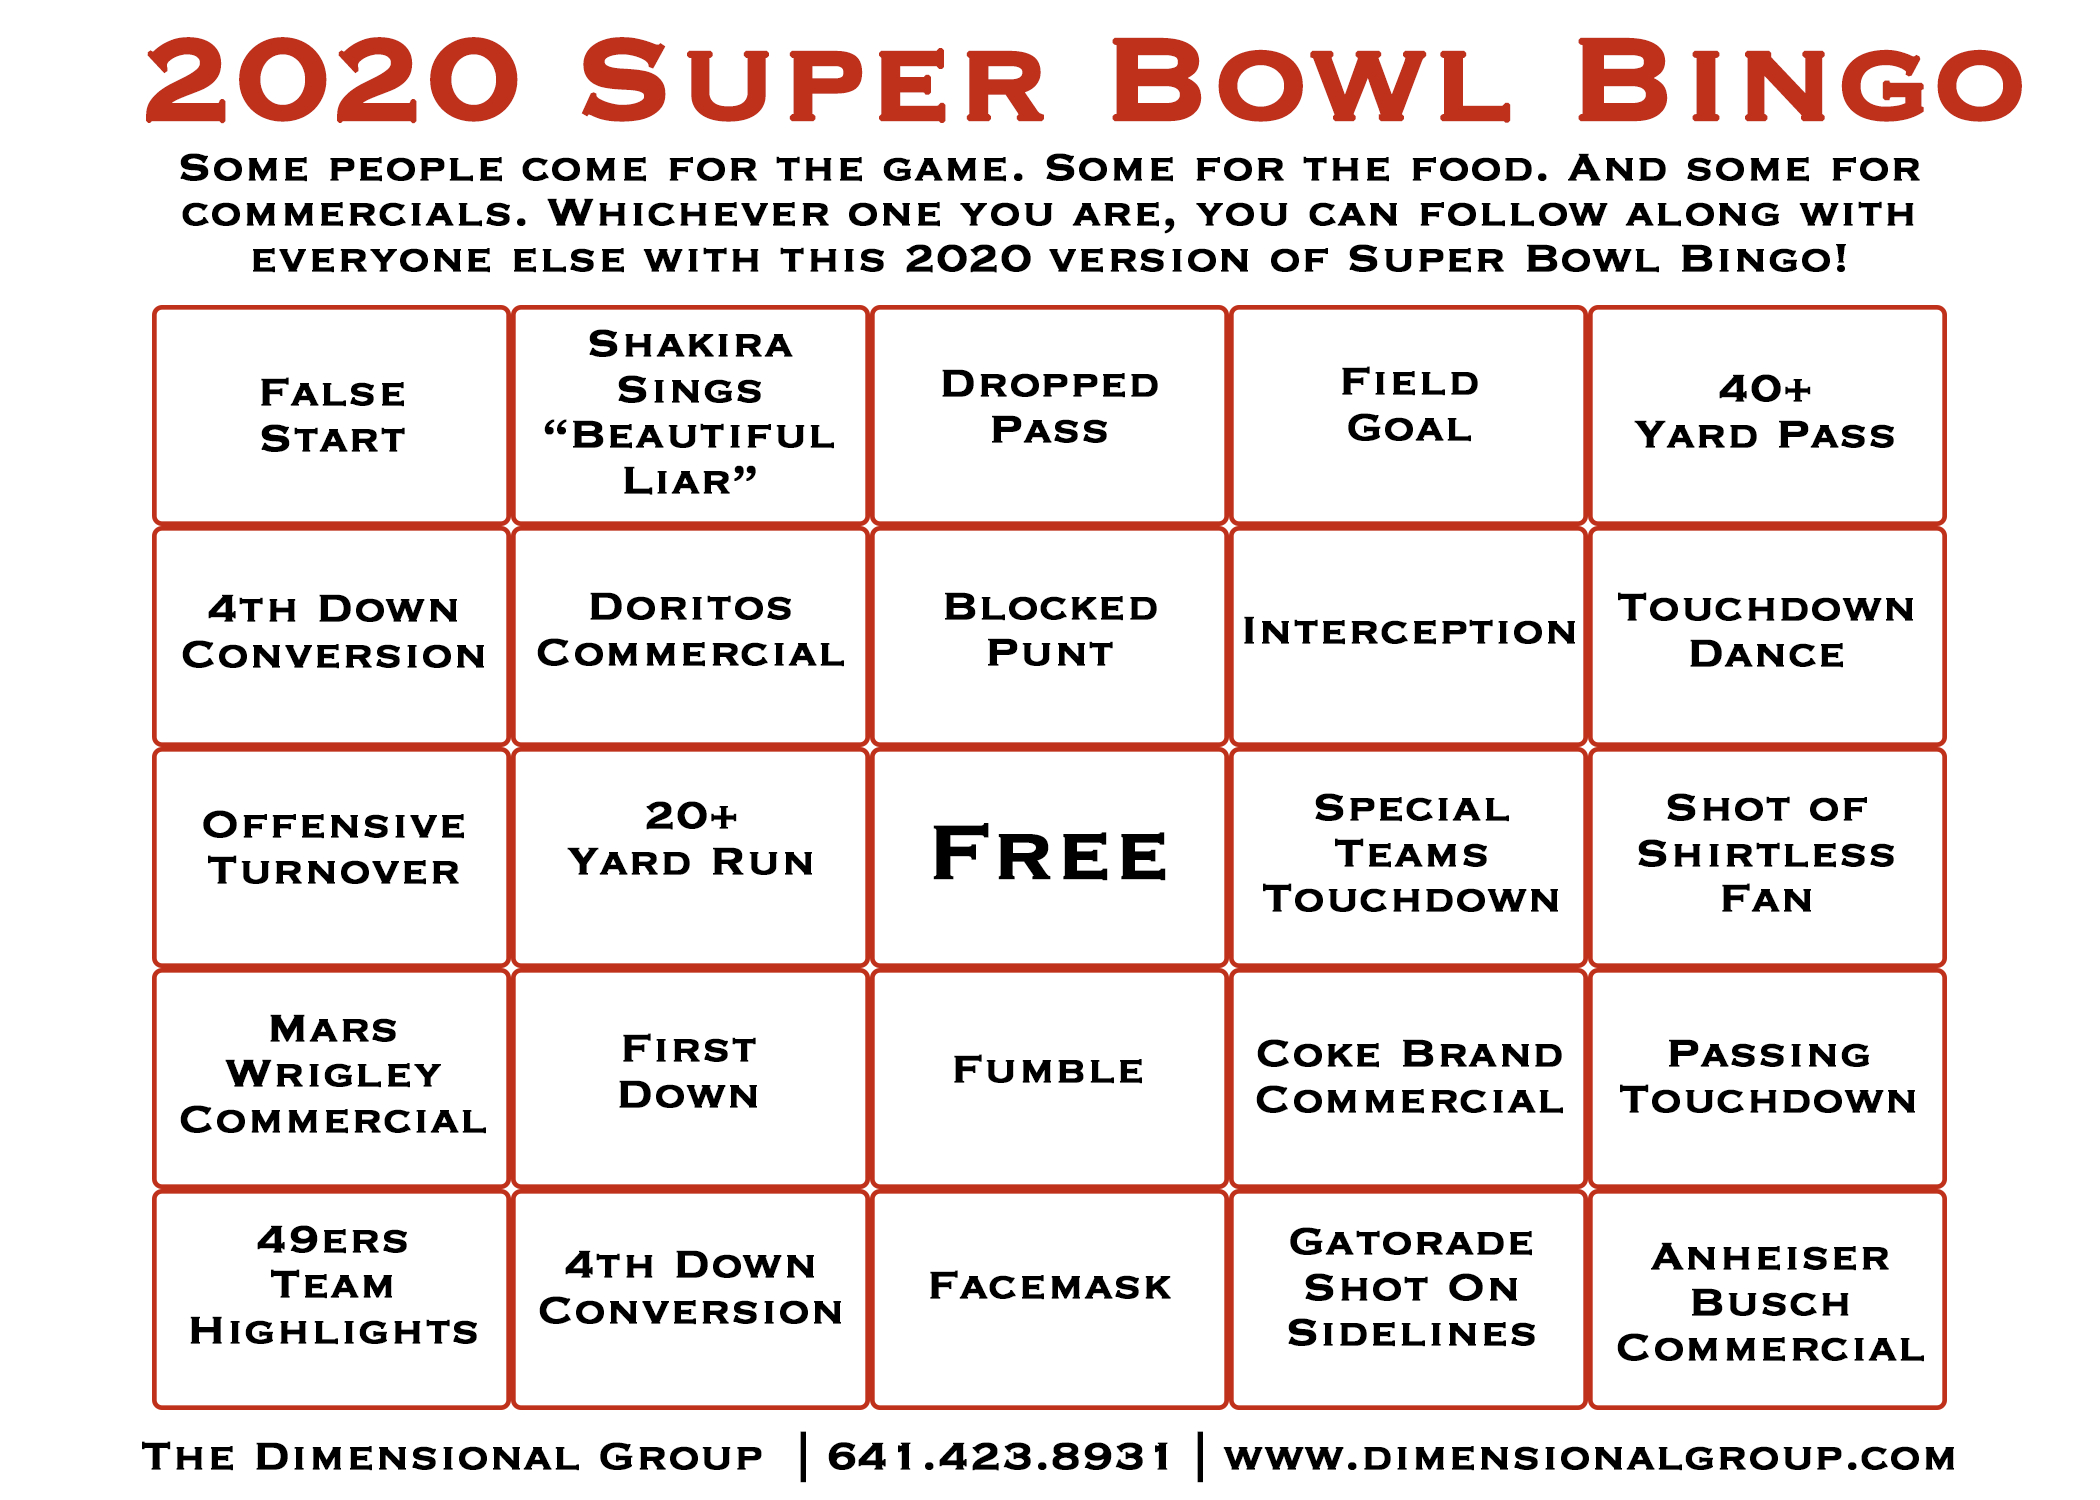 Super Bowl Bingo Cards | The Dimensional Group